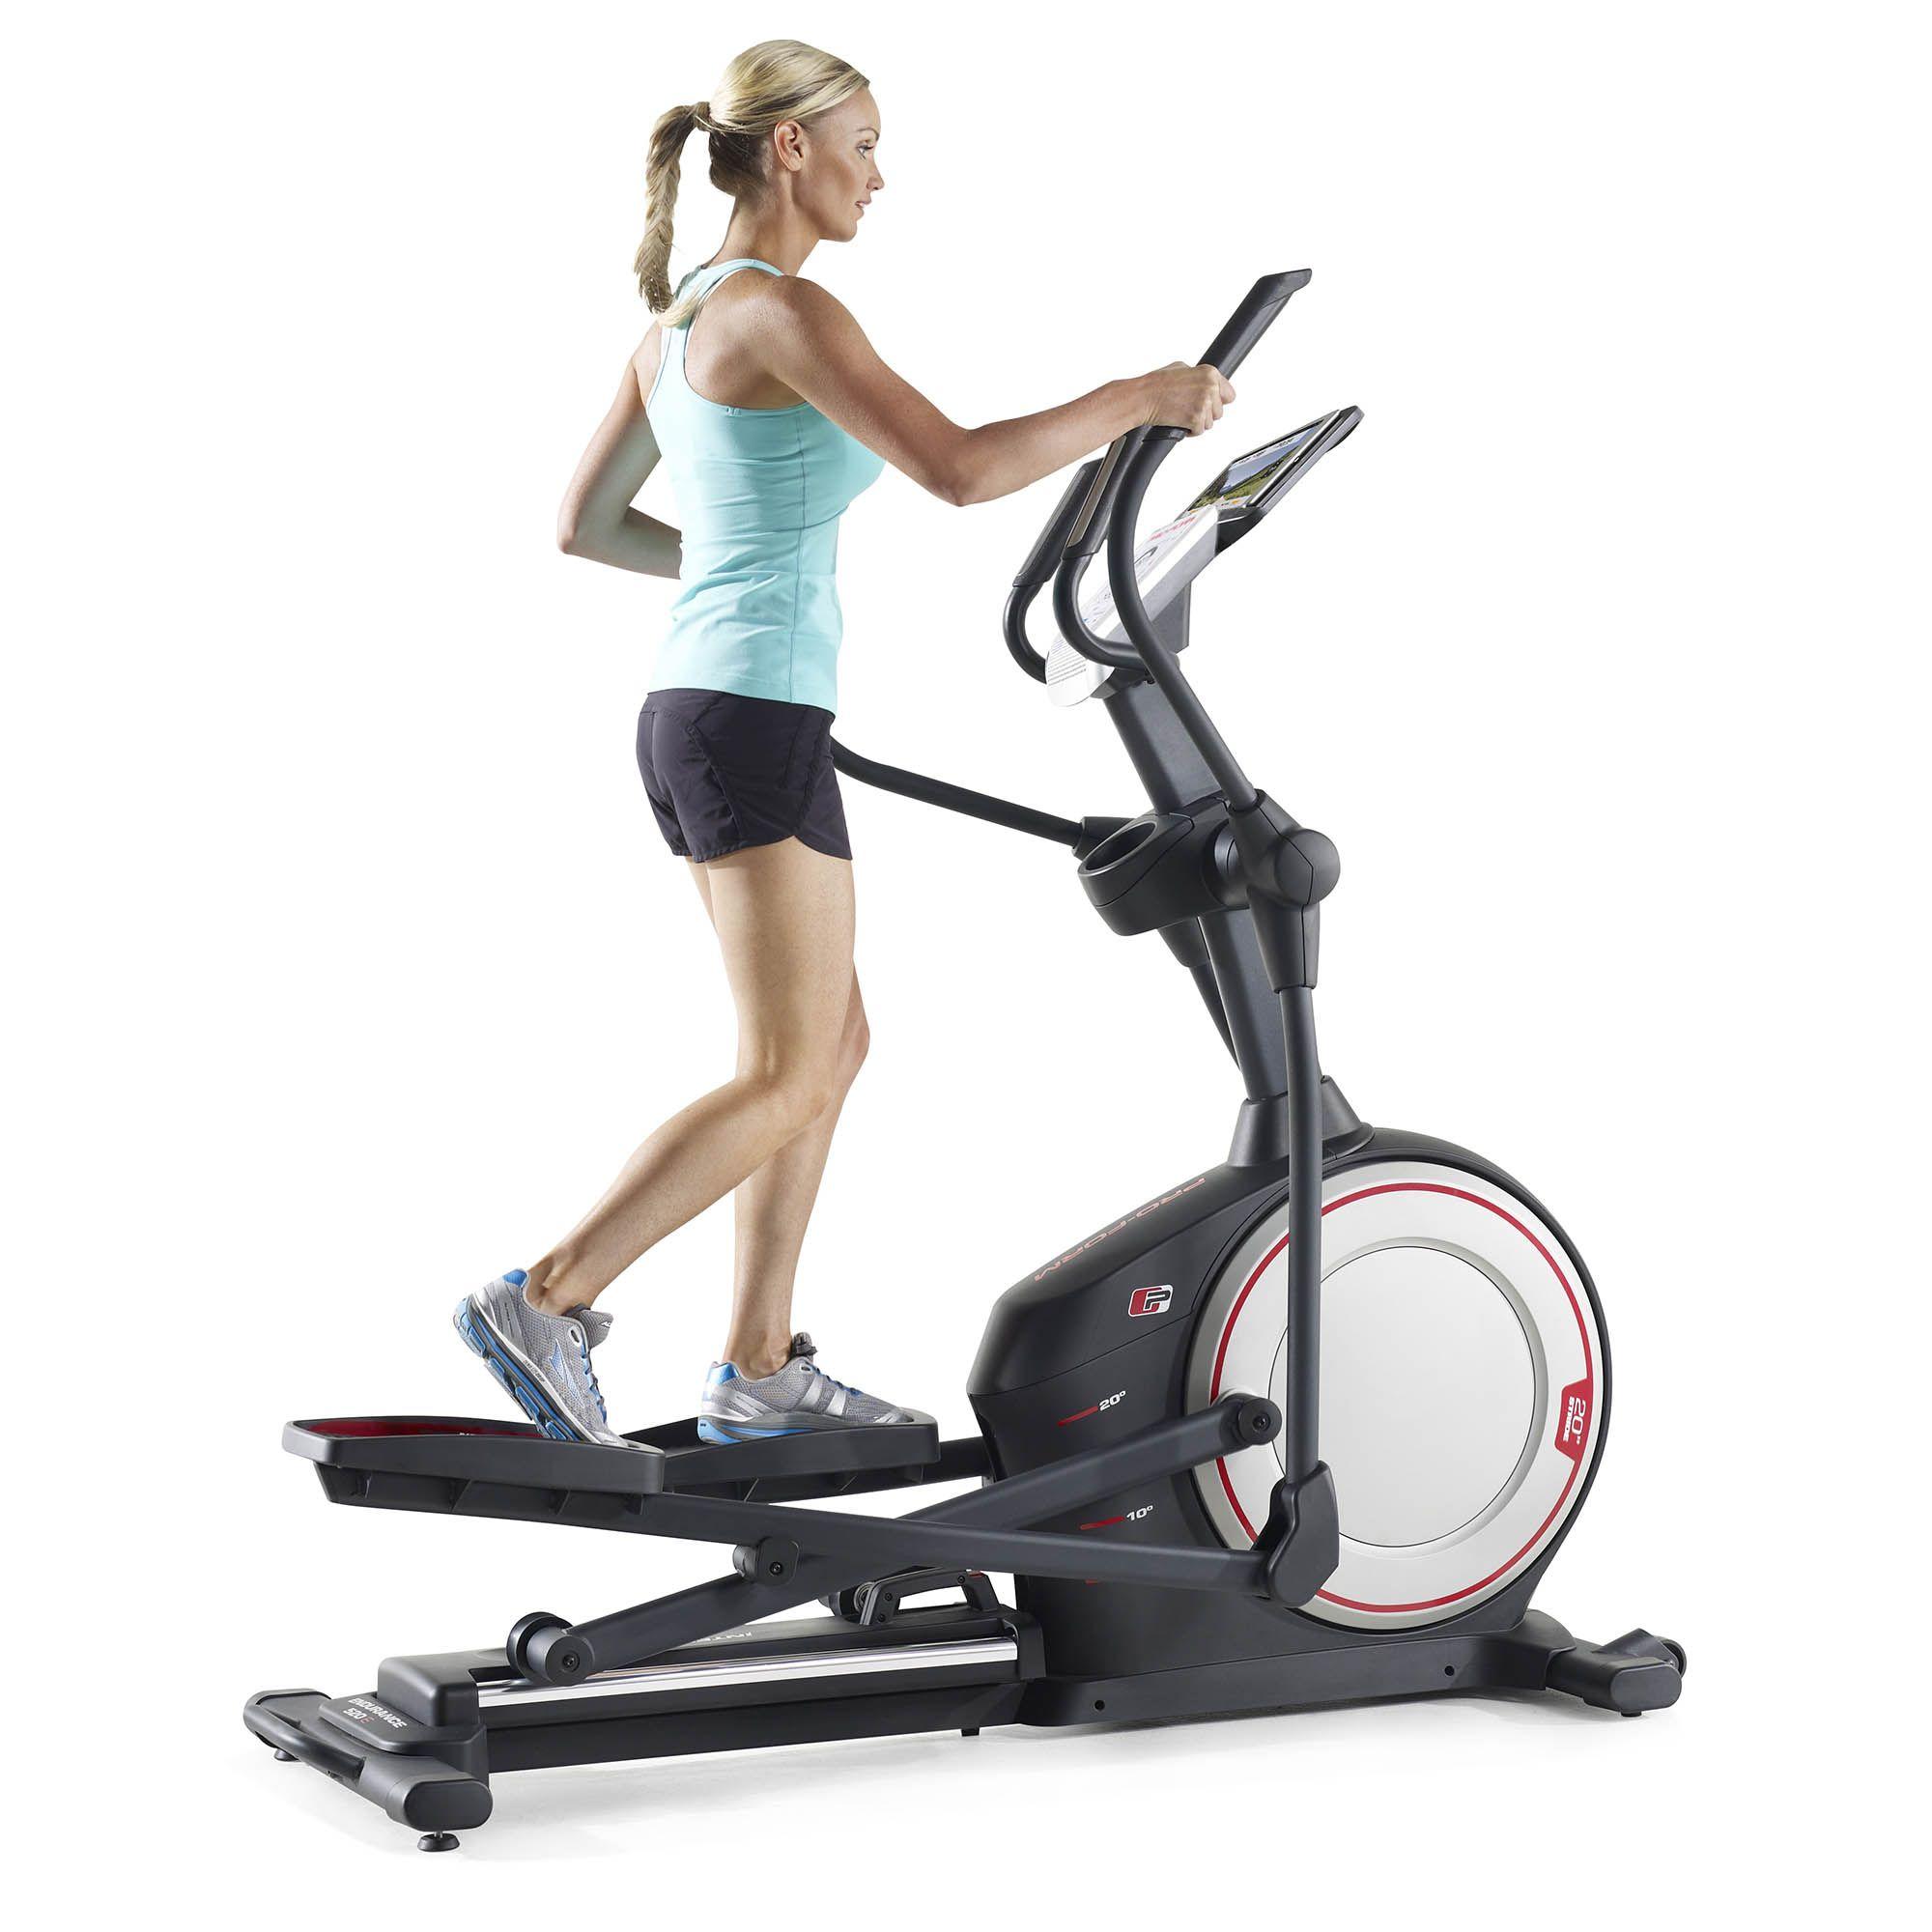 ProForm Endurance 420 E Elliptical Cross Trainer